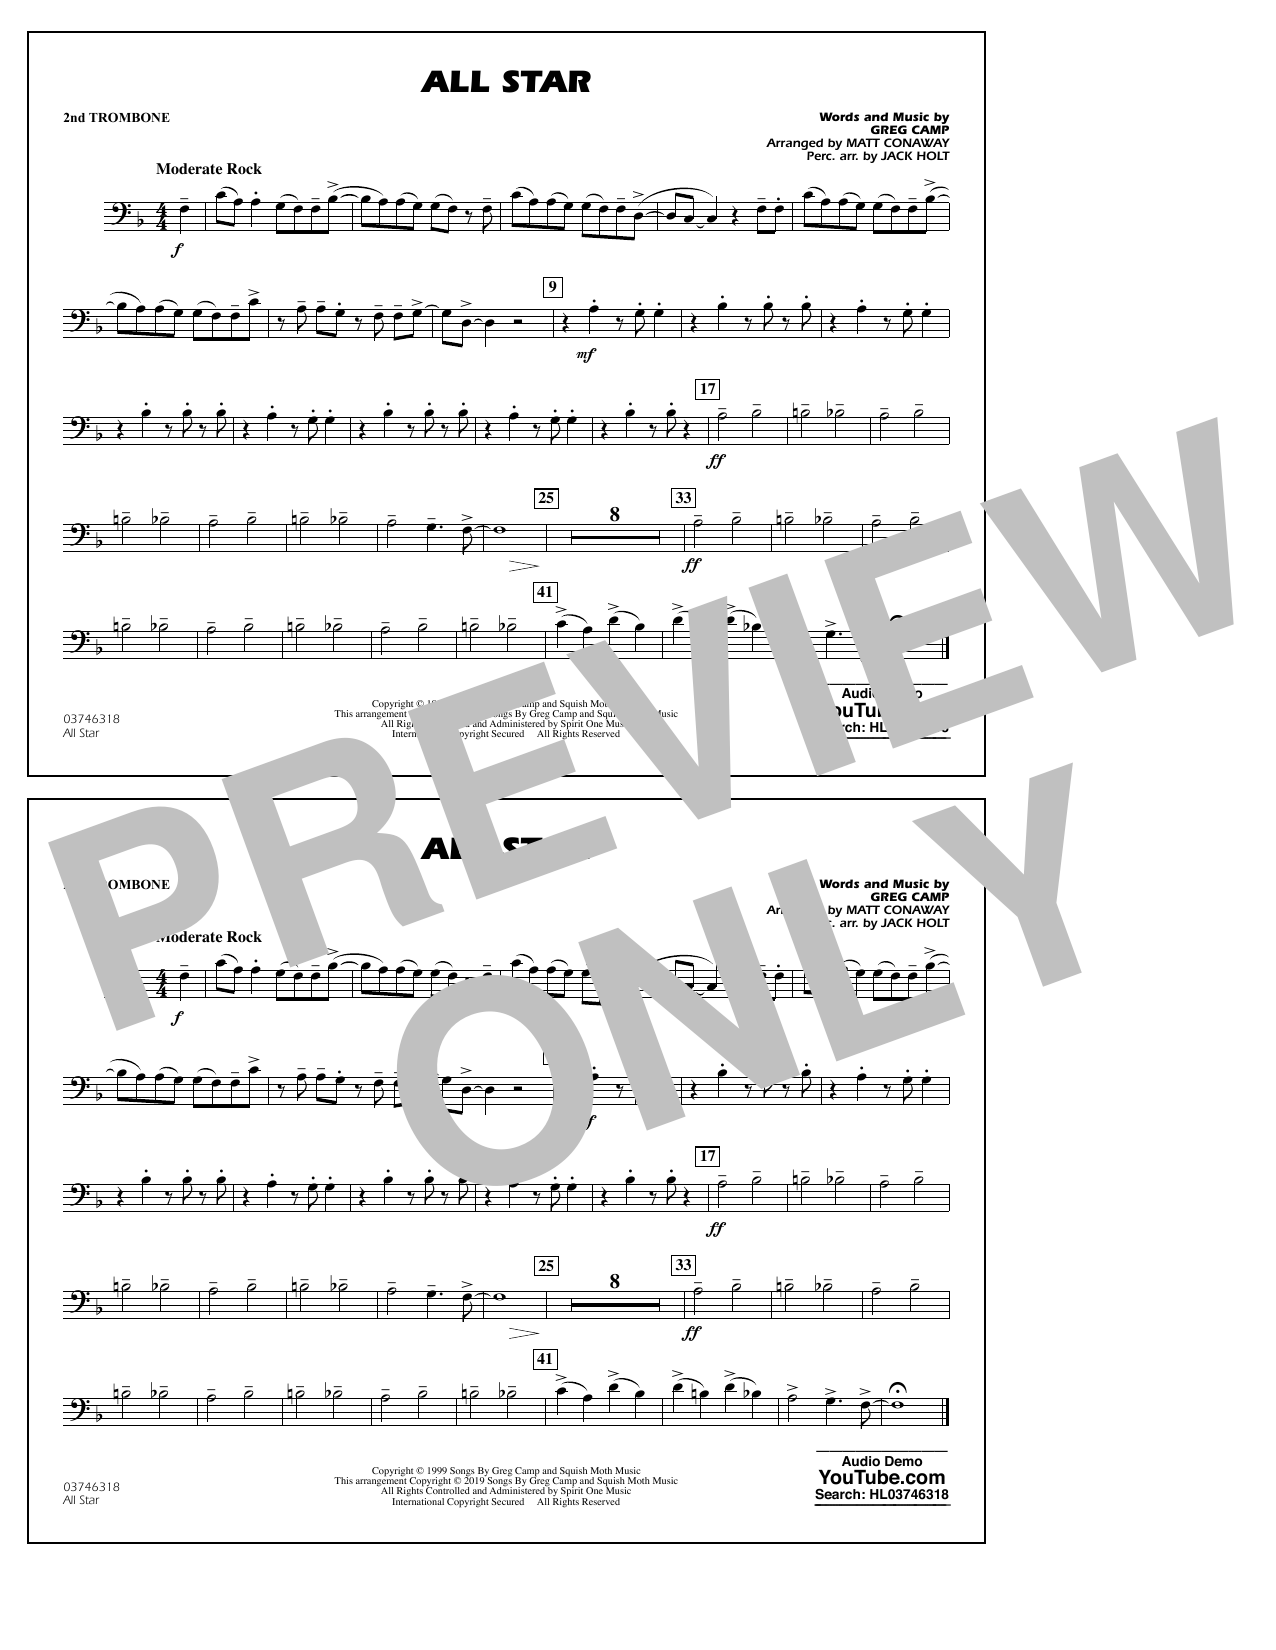 All Star (arr. Matt Conaway) - 2nd Trombone (Marching Band)